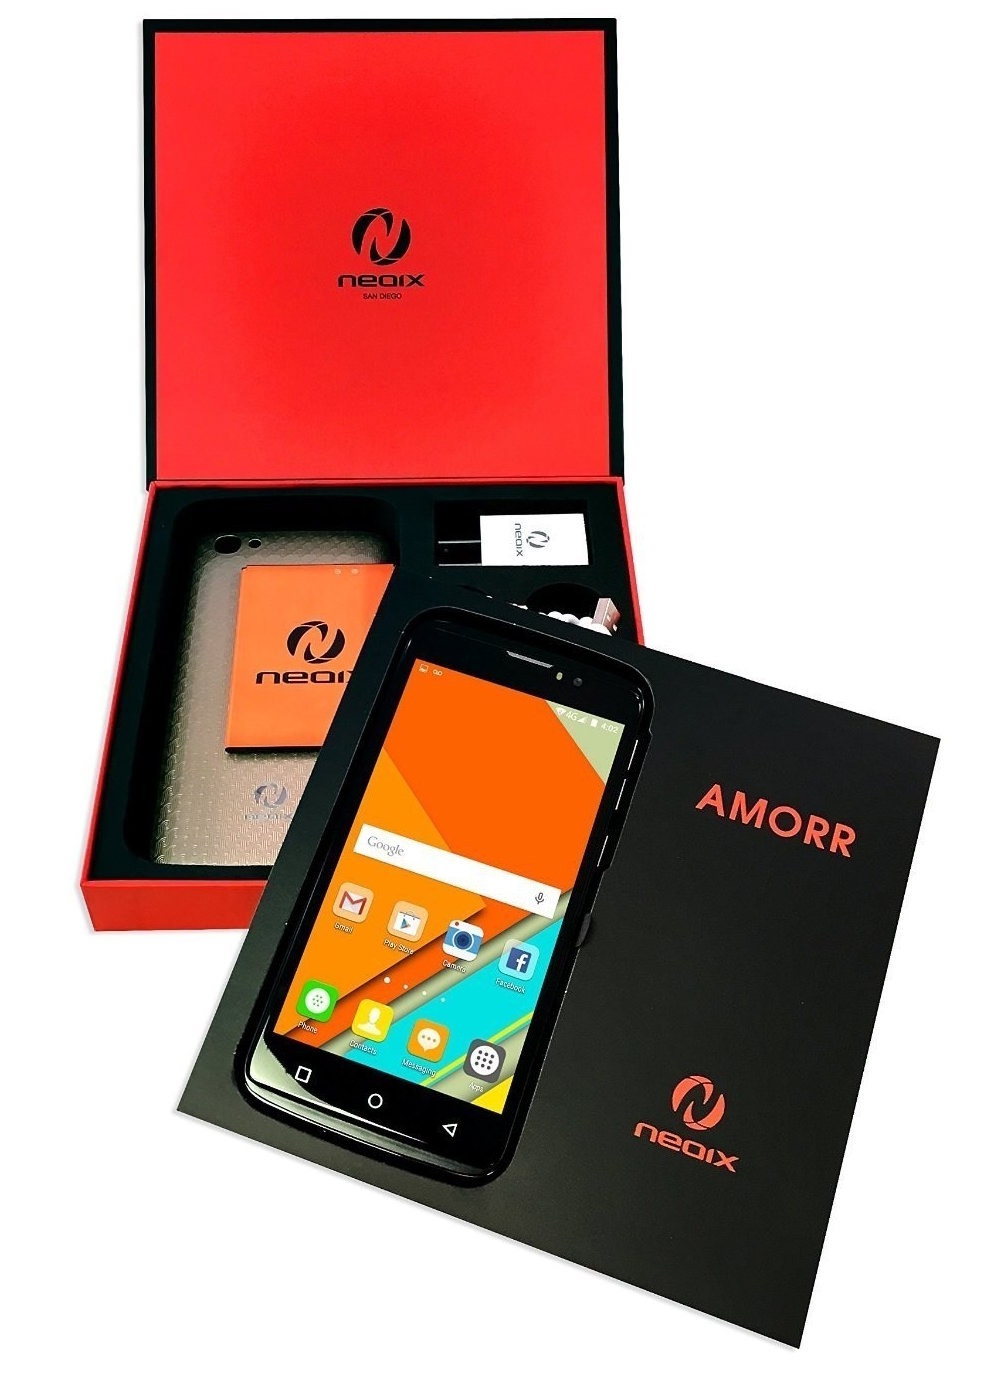 Neoix AMORR Smartphone - box